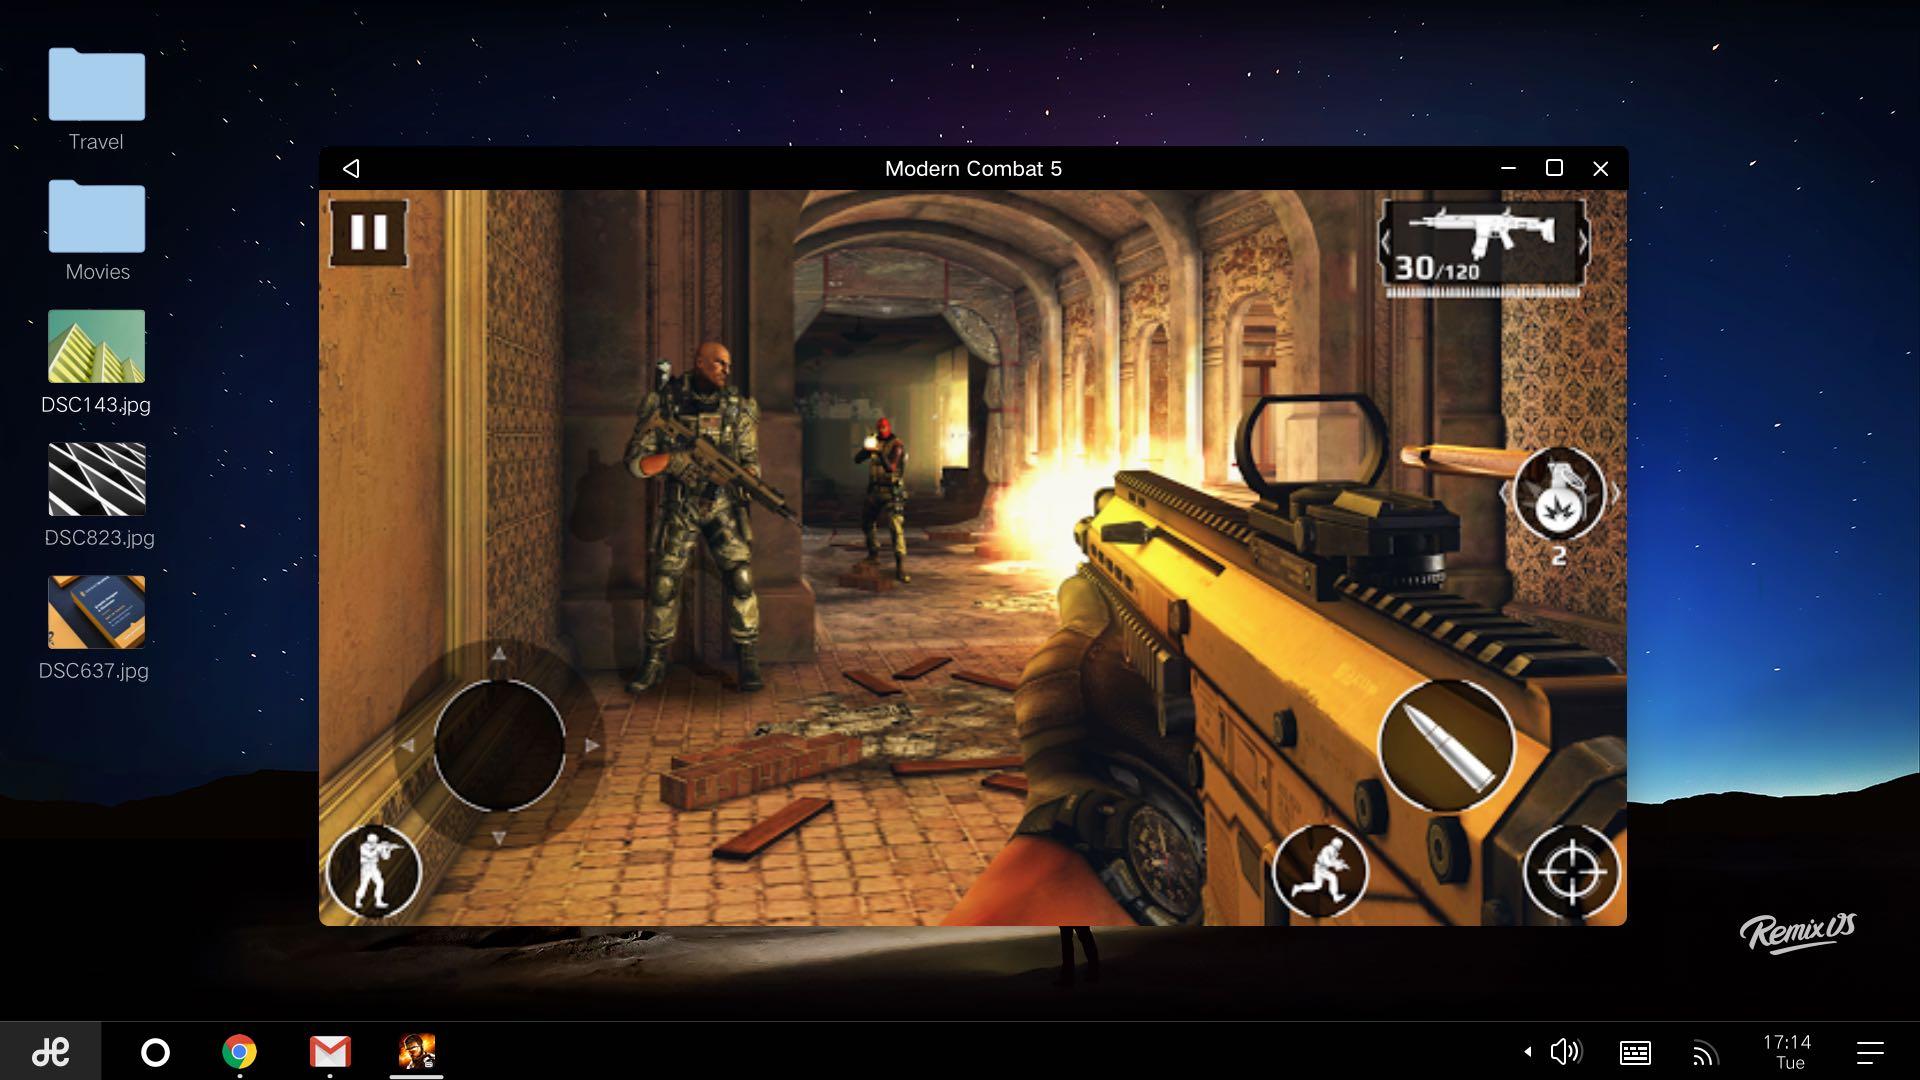 Remix OS games Mac screenshot 001